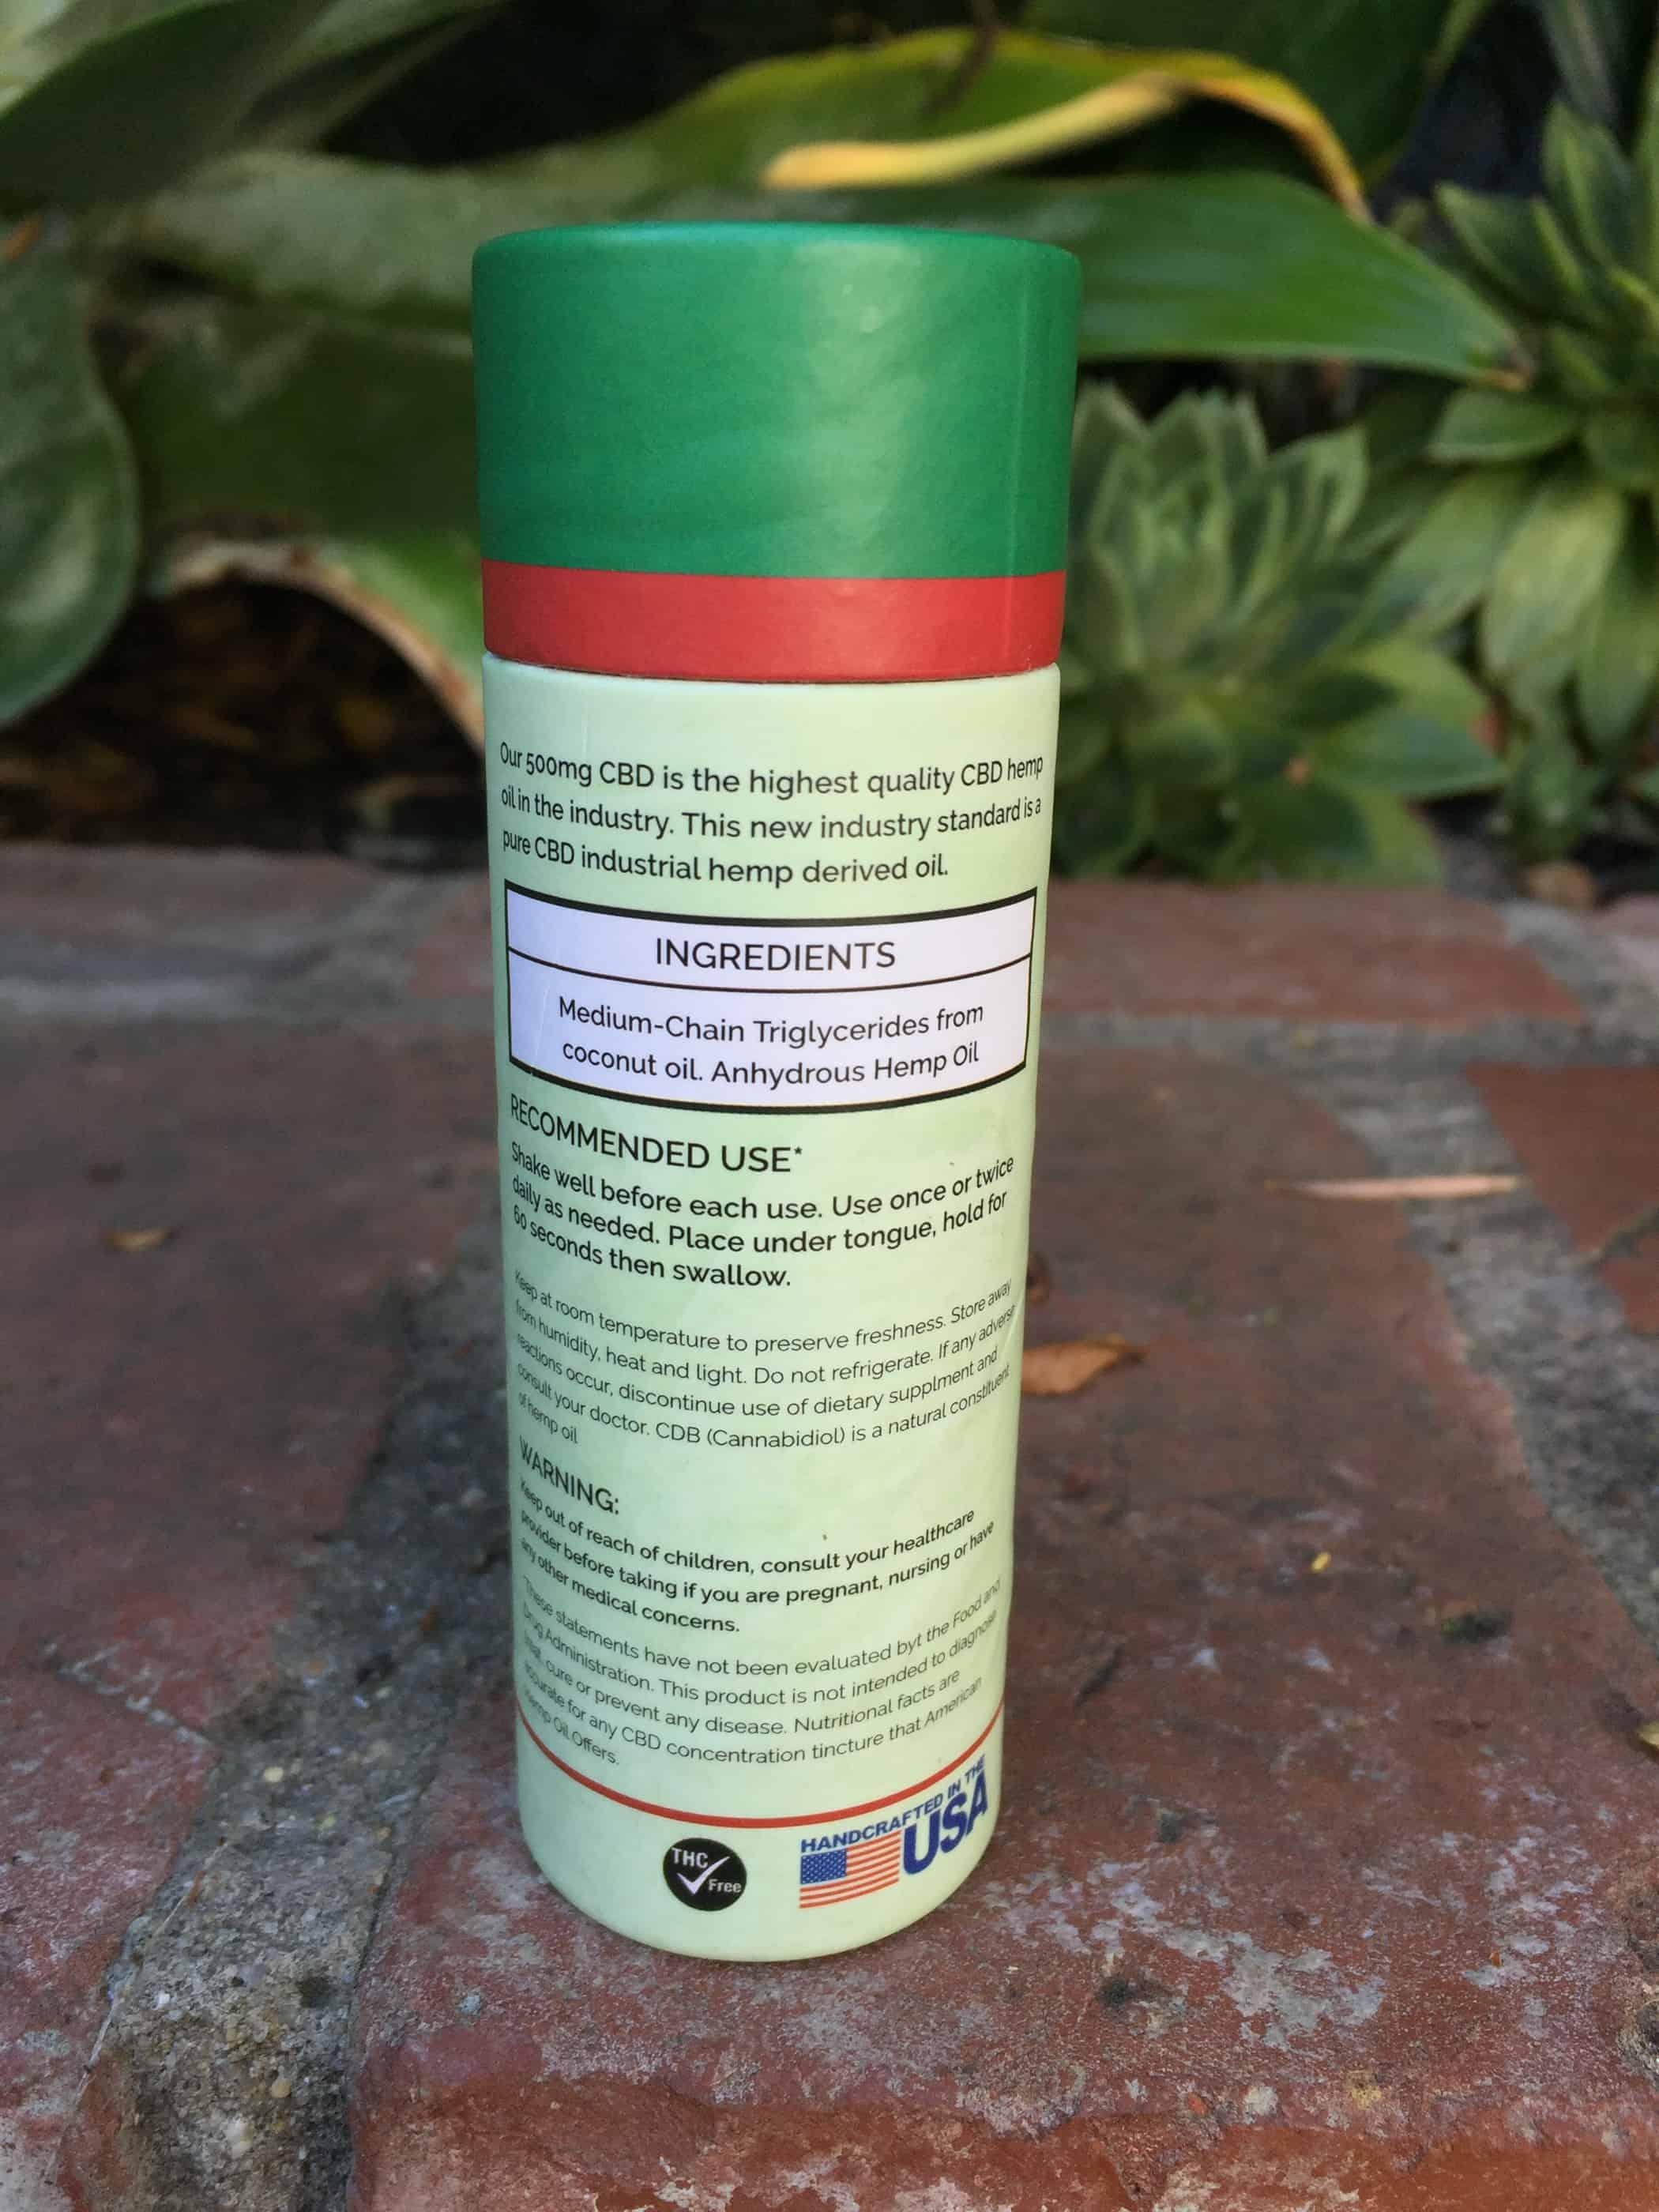 american hemp oil pure cbd hemp oil 500 mg review save on cannabis testing process